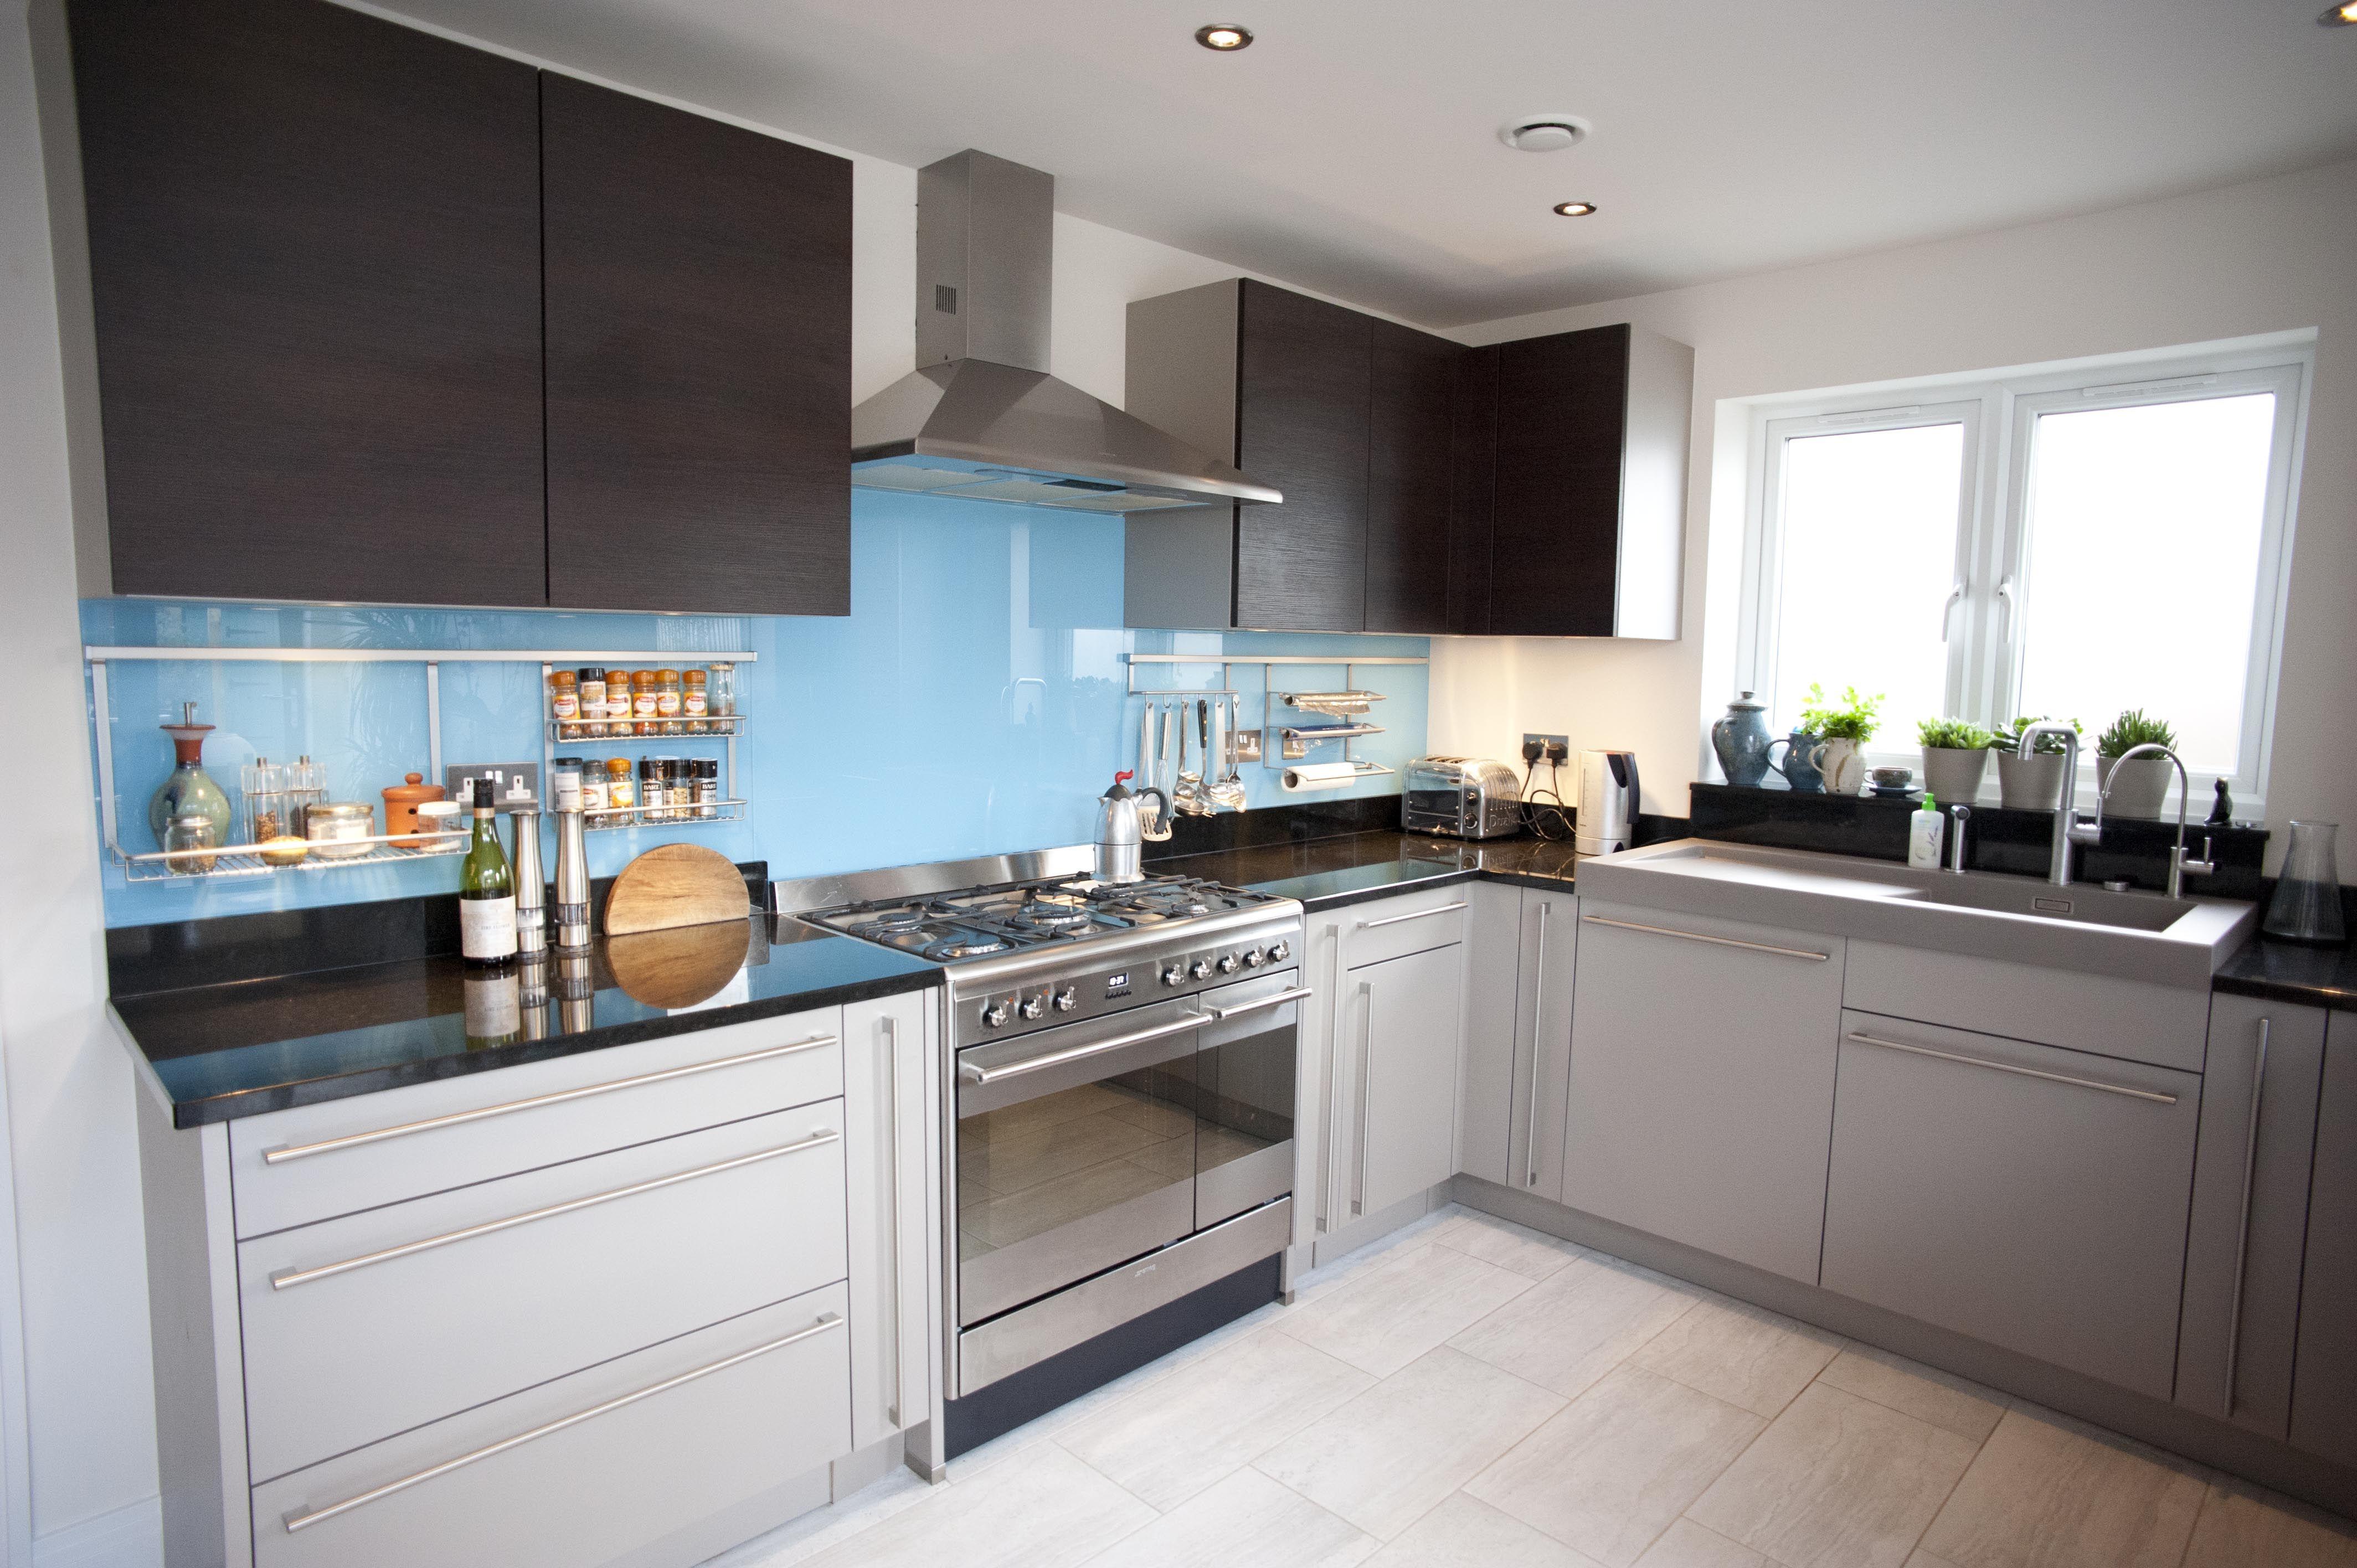 Nolte Kitchens | Glass splashbacks, Kitchens and Walls